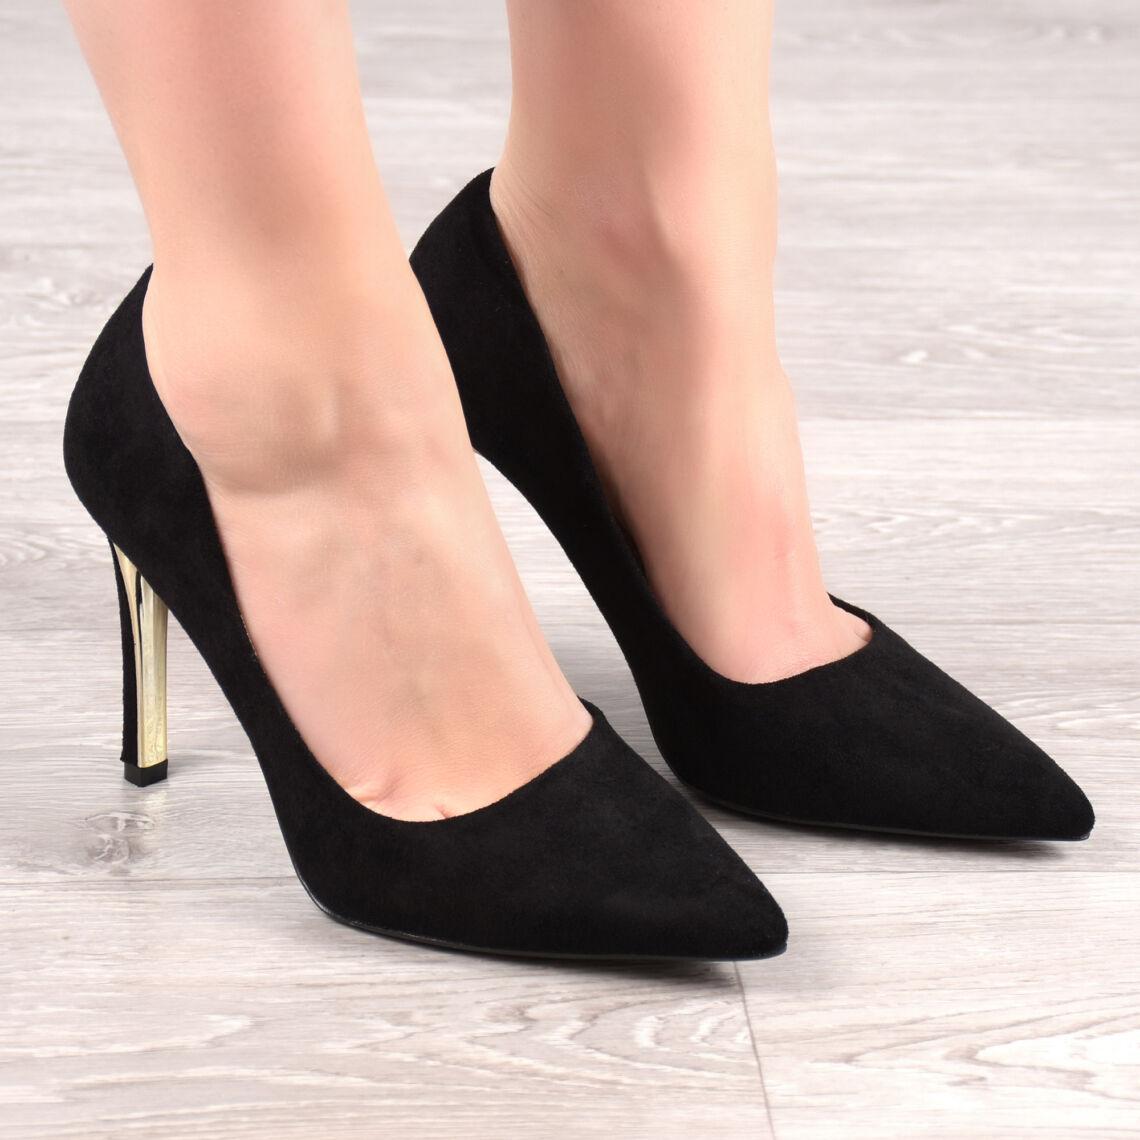 72fcb52714 Fekete Metál Sarkú Női Művelúr Magassarkú - ALKALMI CIPŐK - Női cipő ...